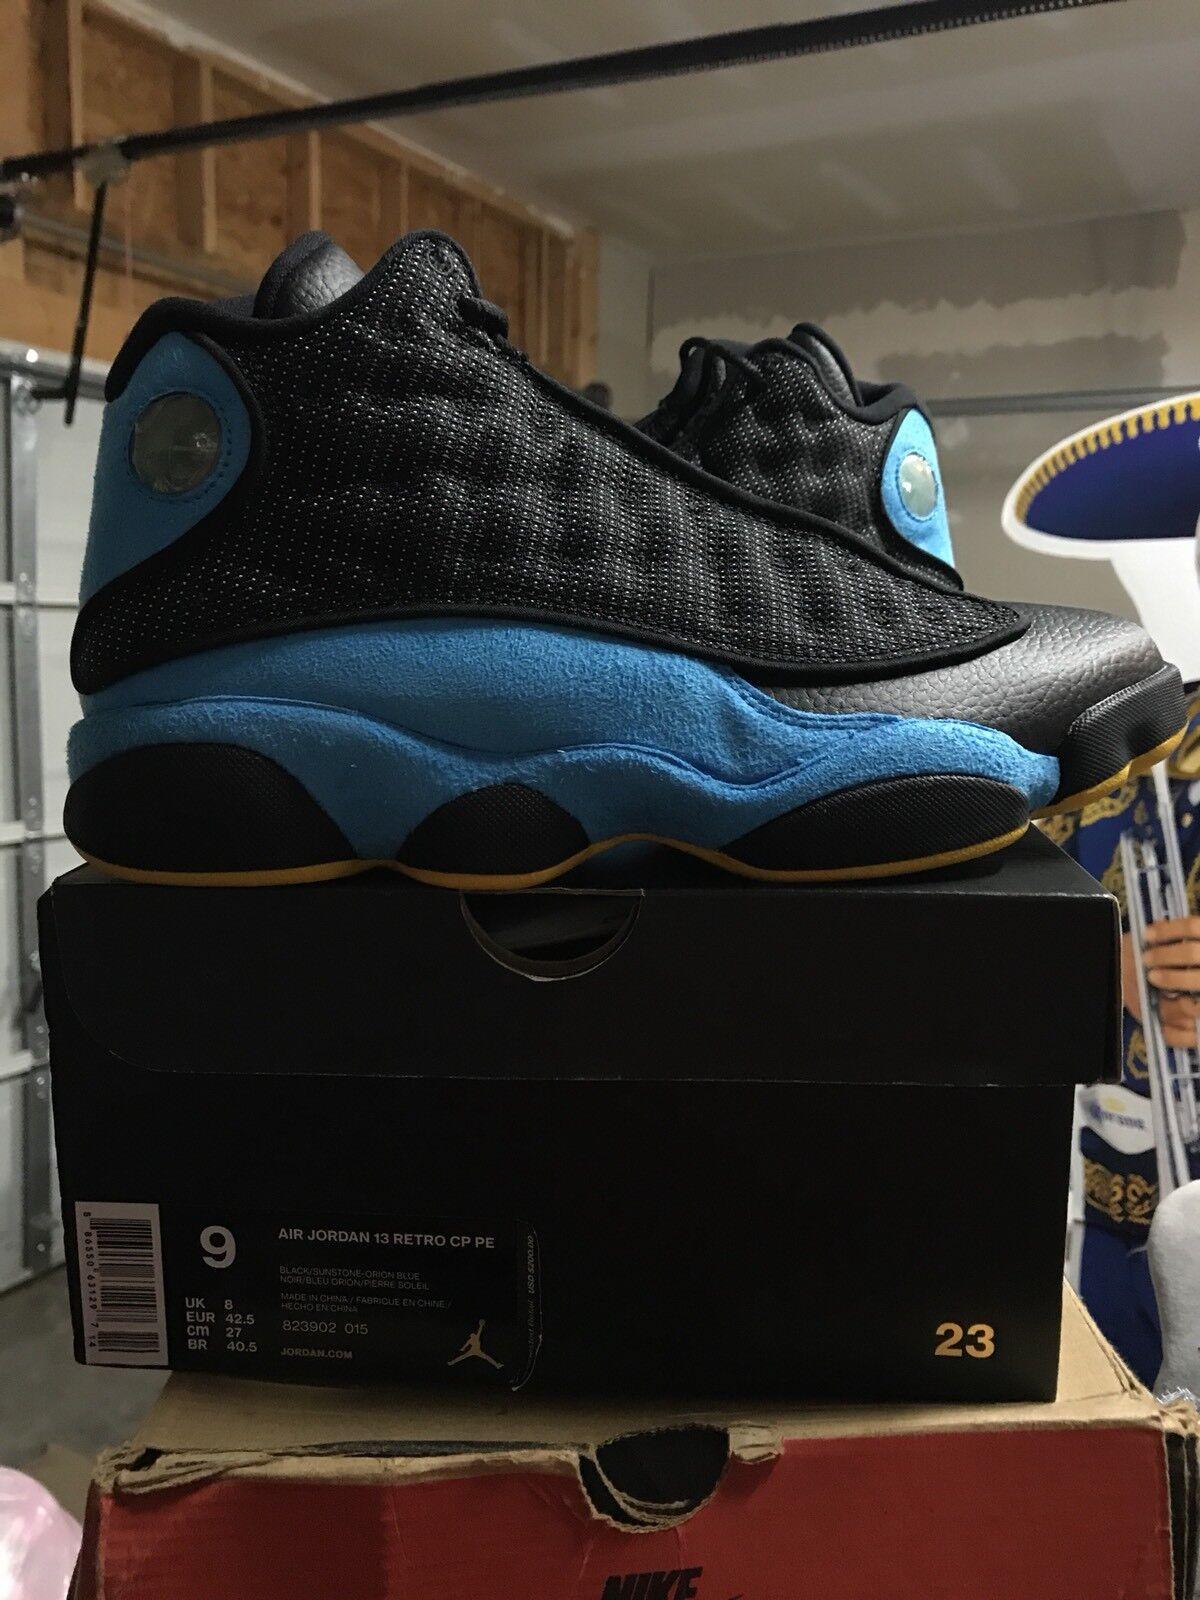 Air jordan 13 cp3 chris retro paul blau - gelbe retro chris - sneaker größe 9 pe xiii xi a88209